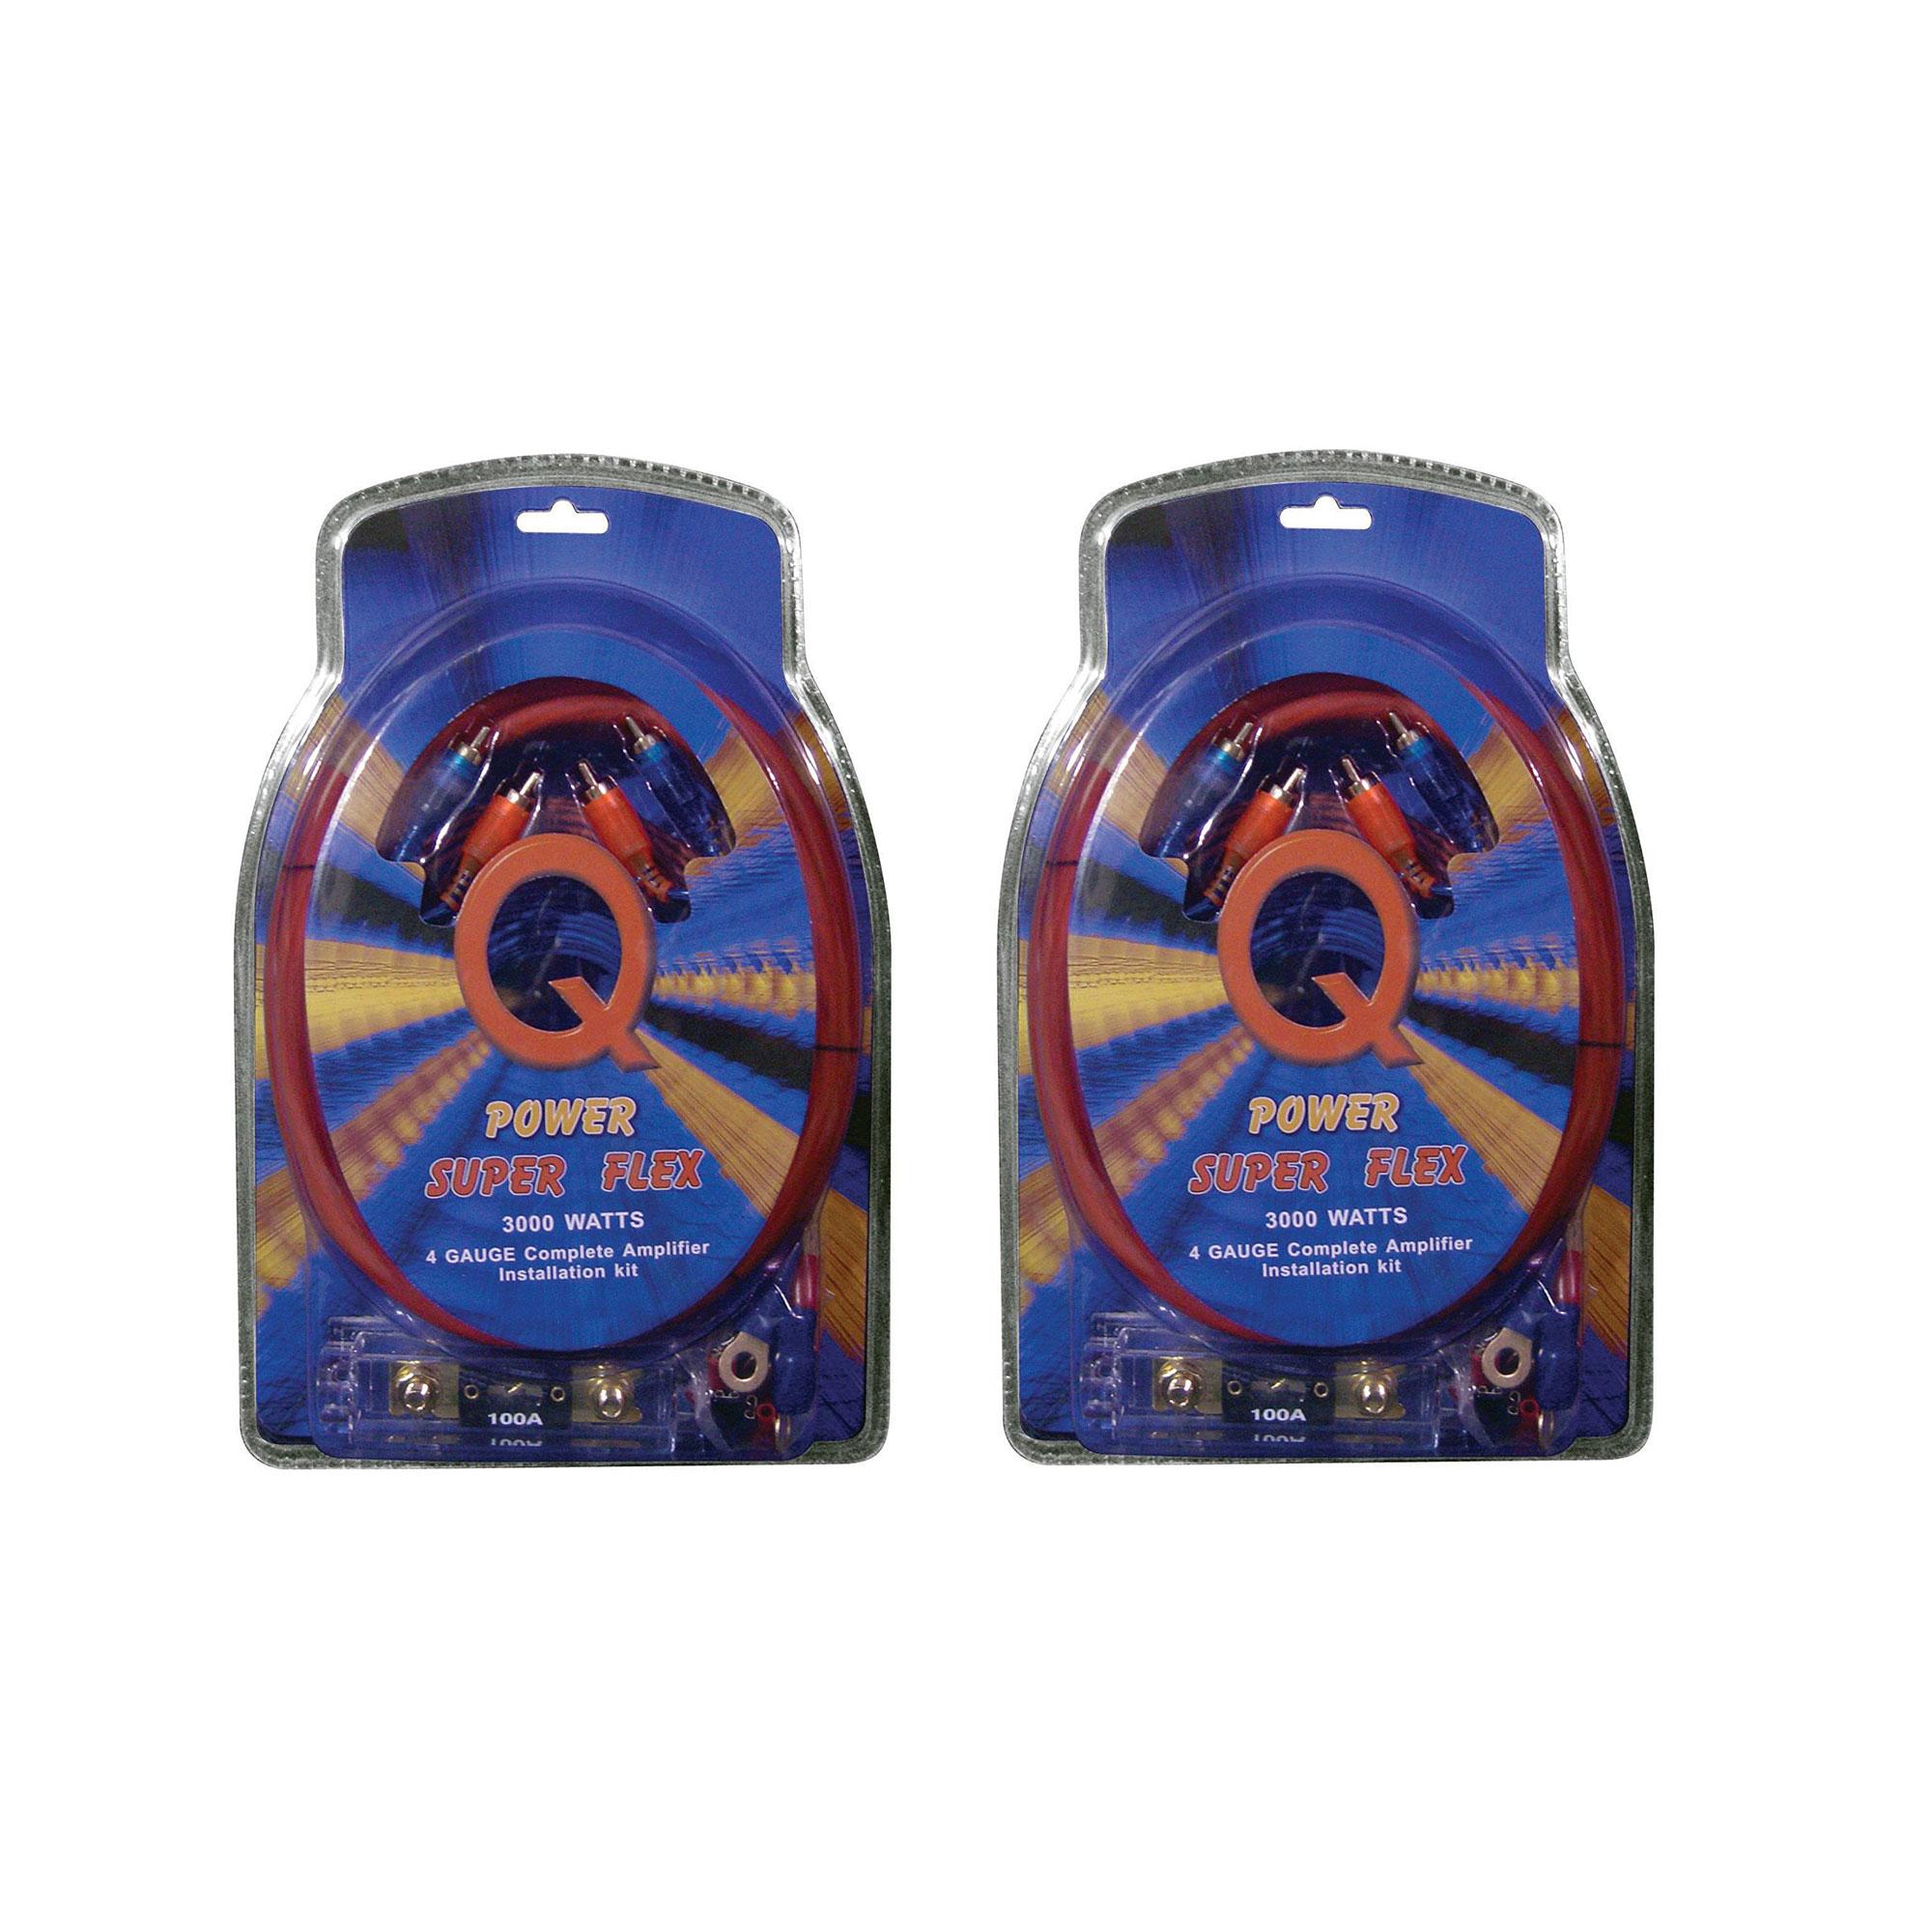 Q Power Super Flex 4 Gauge 3000 Watt Amplifier Car Audio Wiring Amp Bullz Sub Install Kit 2 Pack